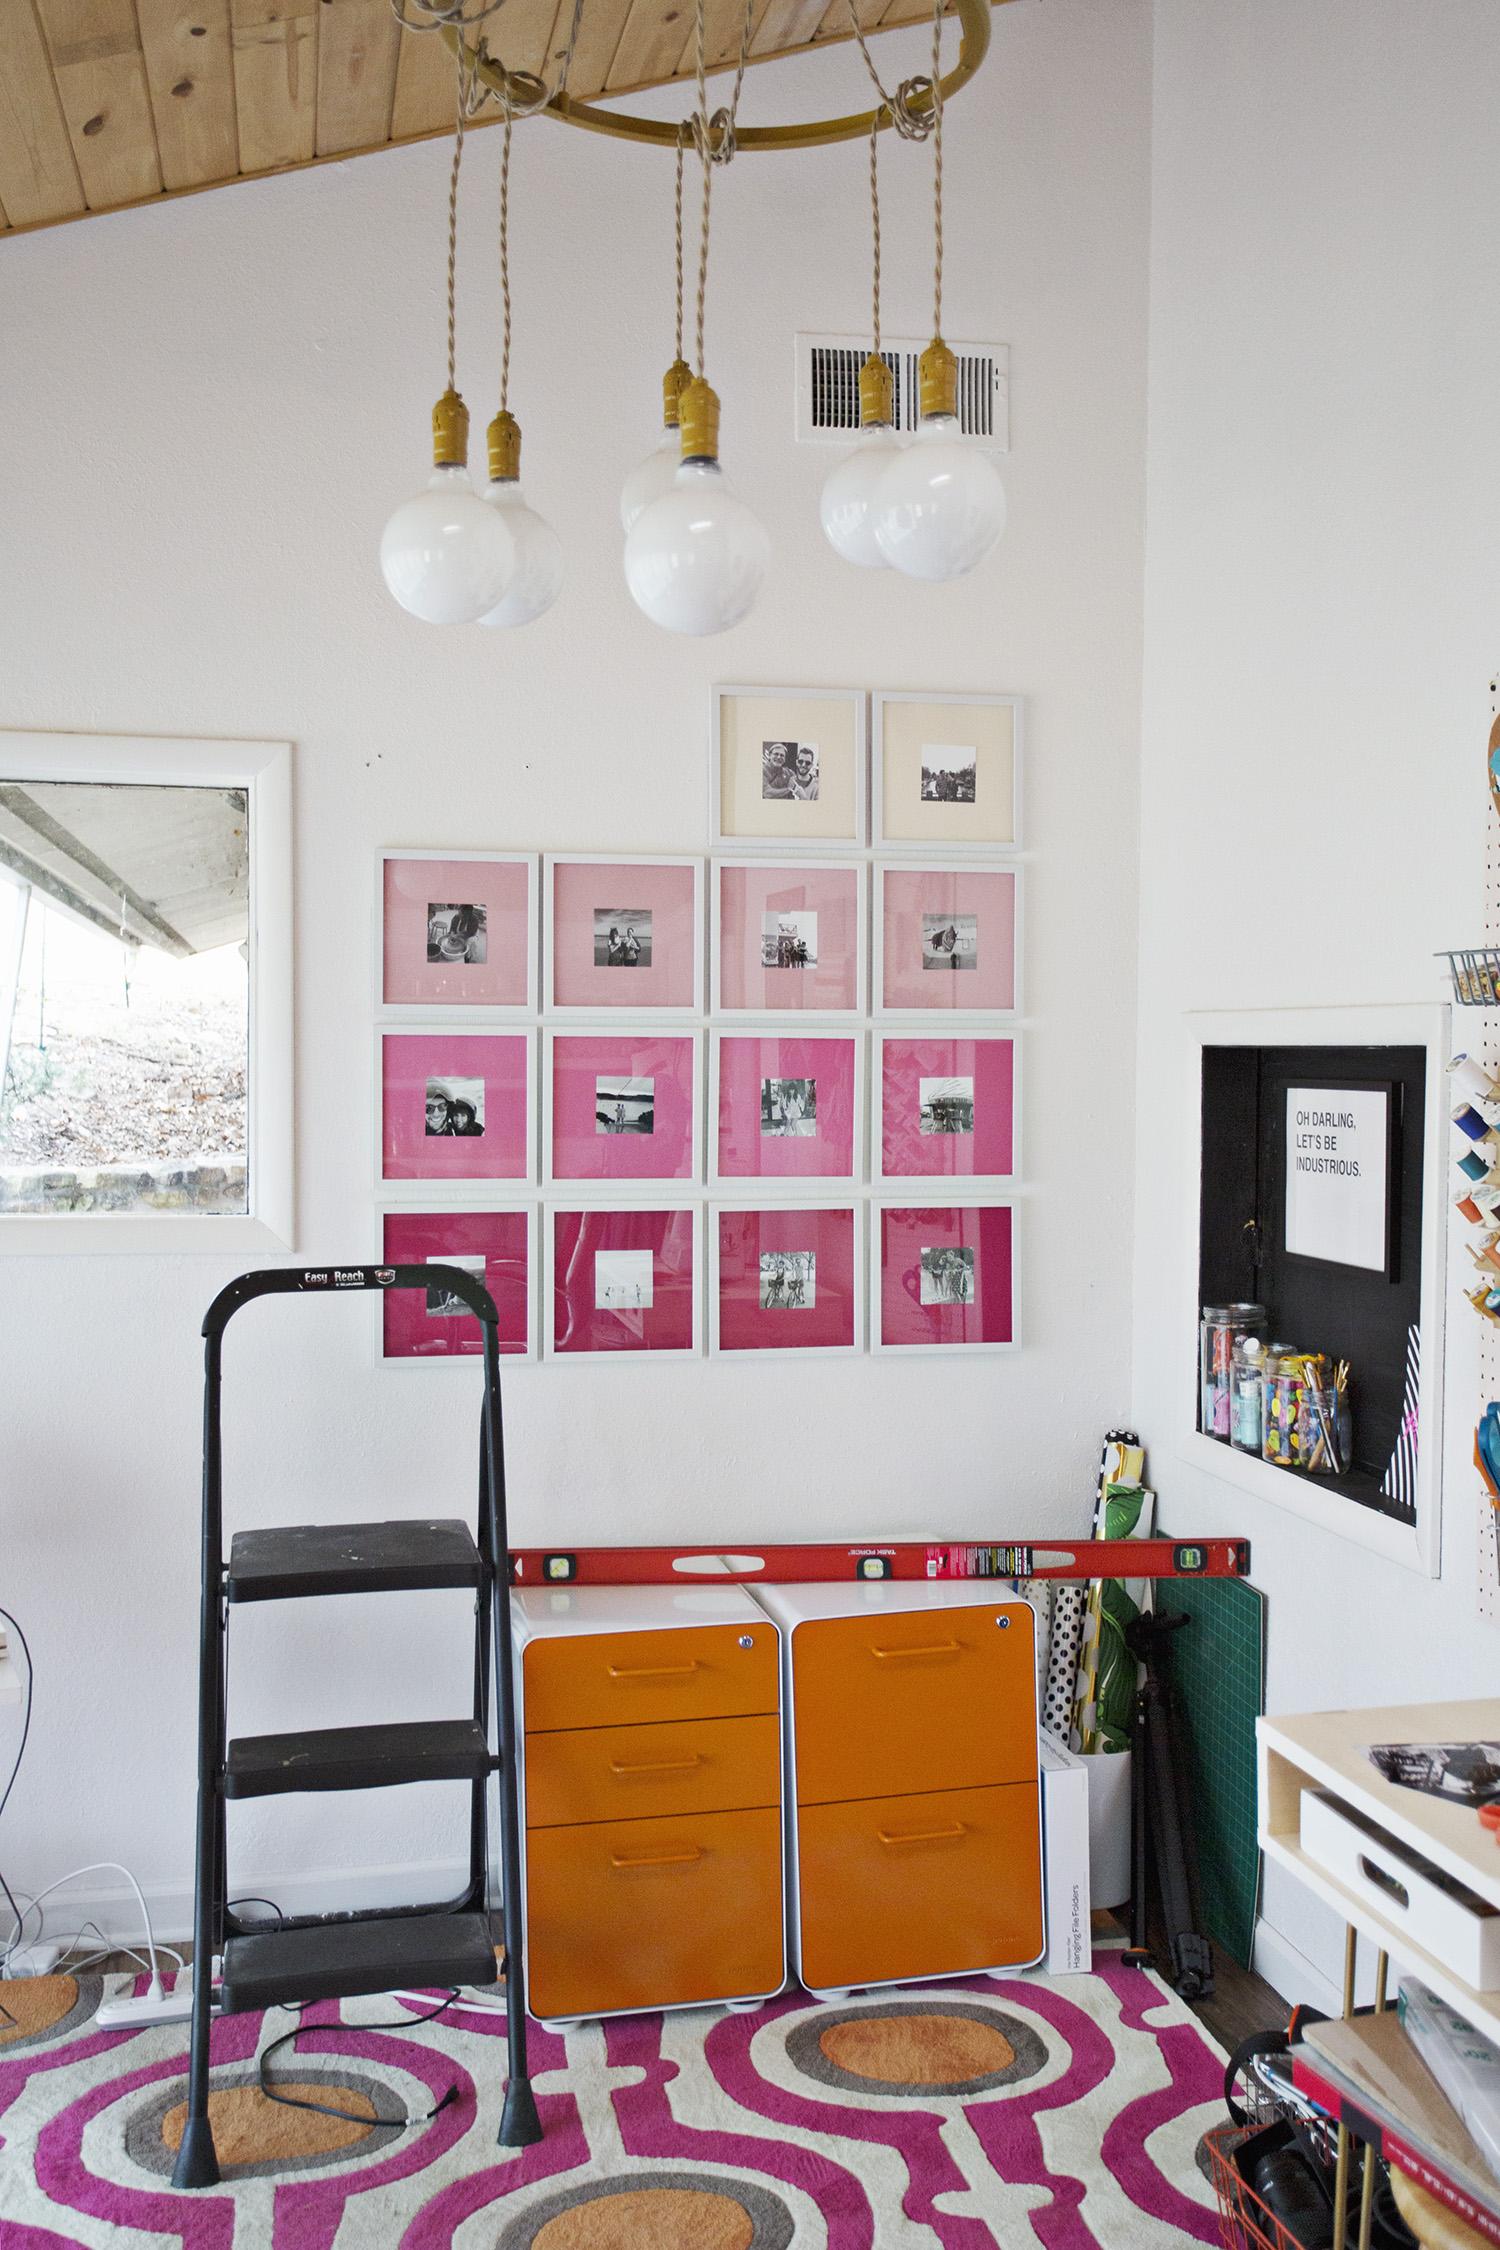 Hang the frames